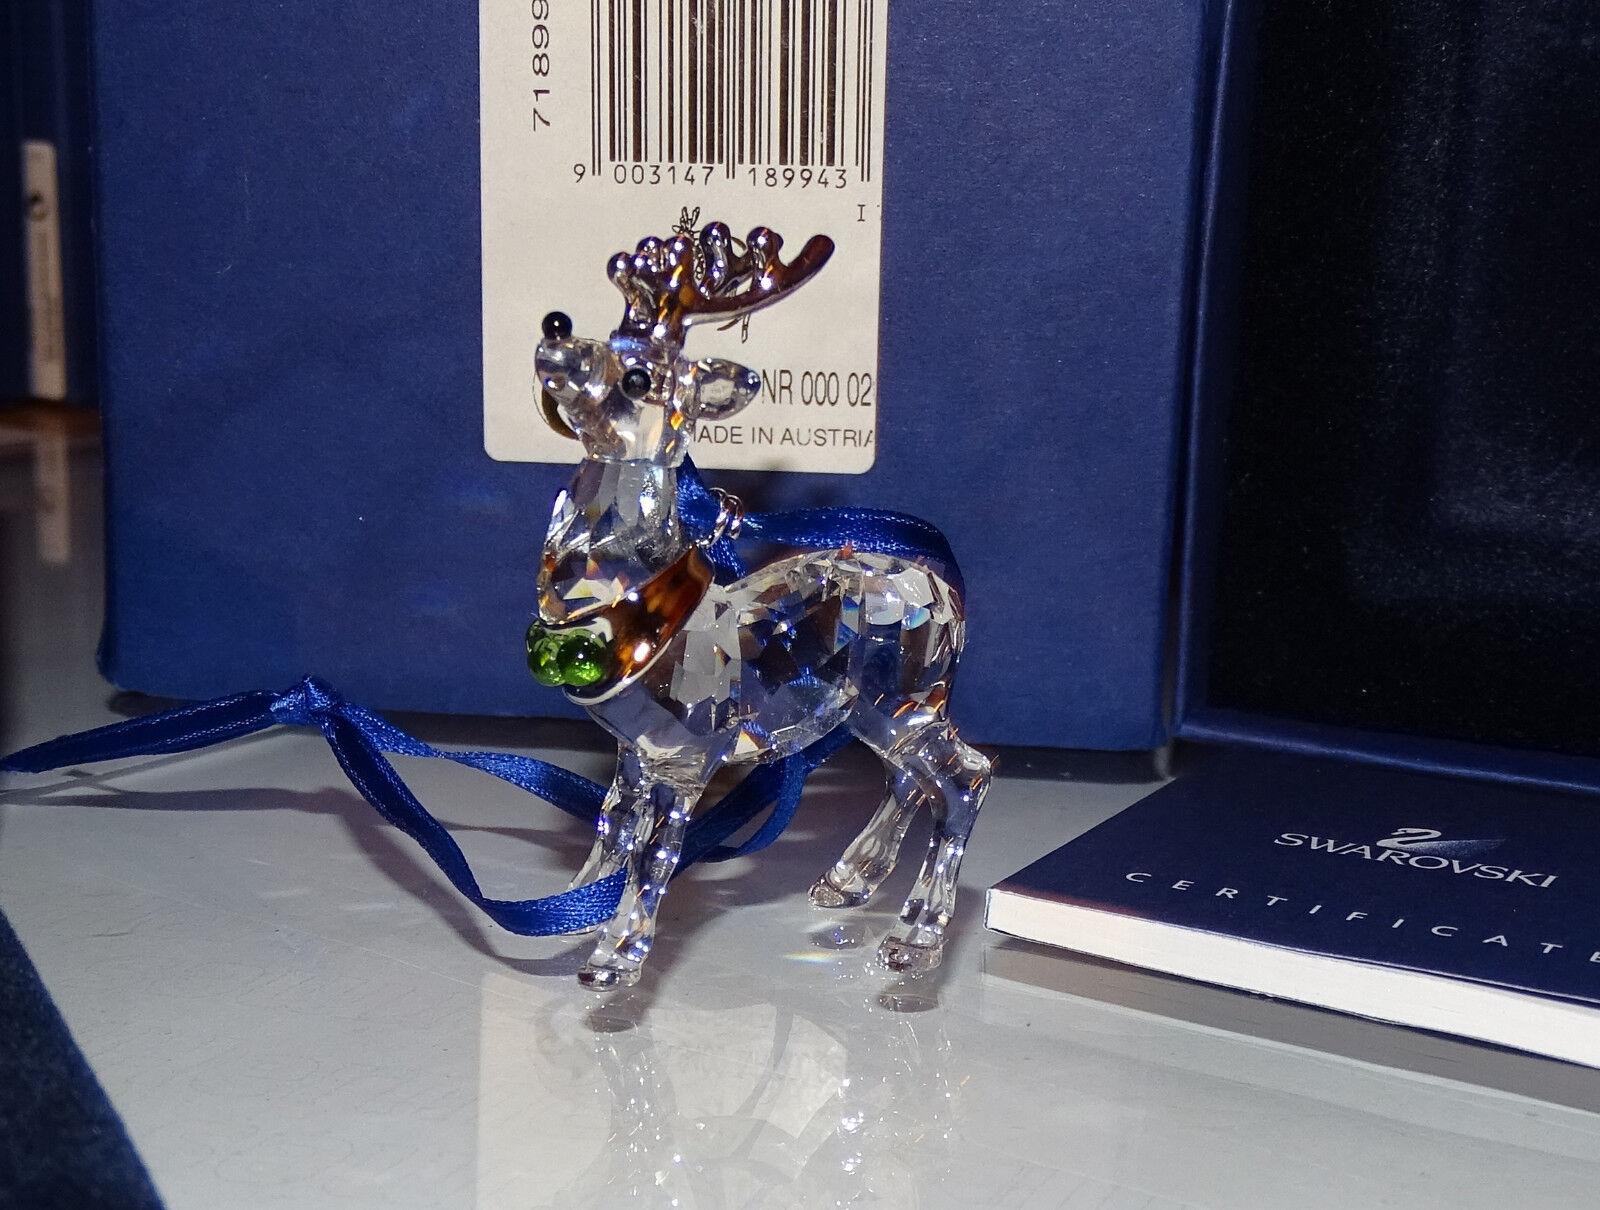 Swarovski 2005 - 2007 ornament reno rodio Reindeer 718994 OVP